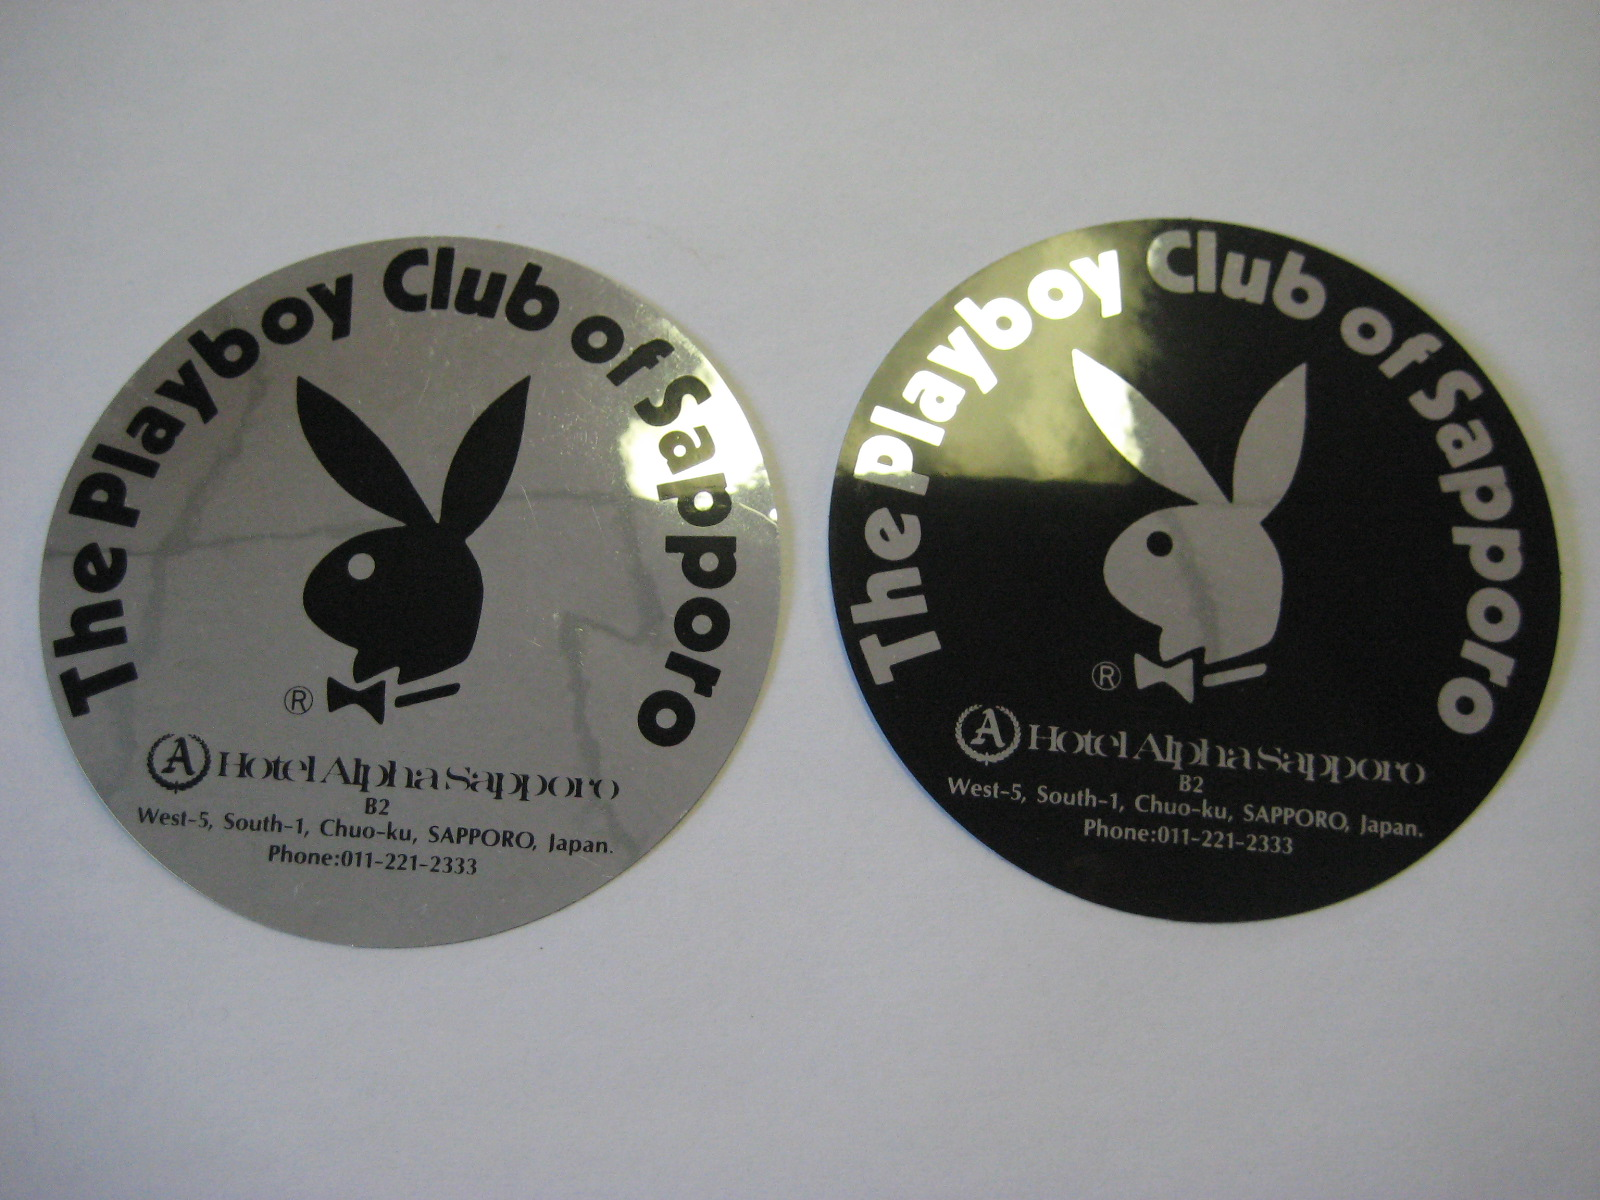 Playboy Club of Sapporo metallic stickers